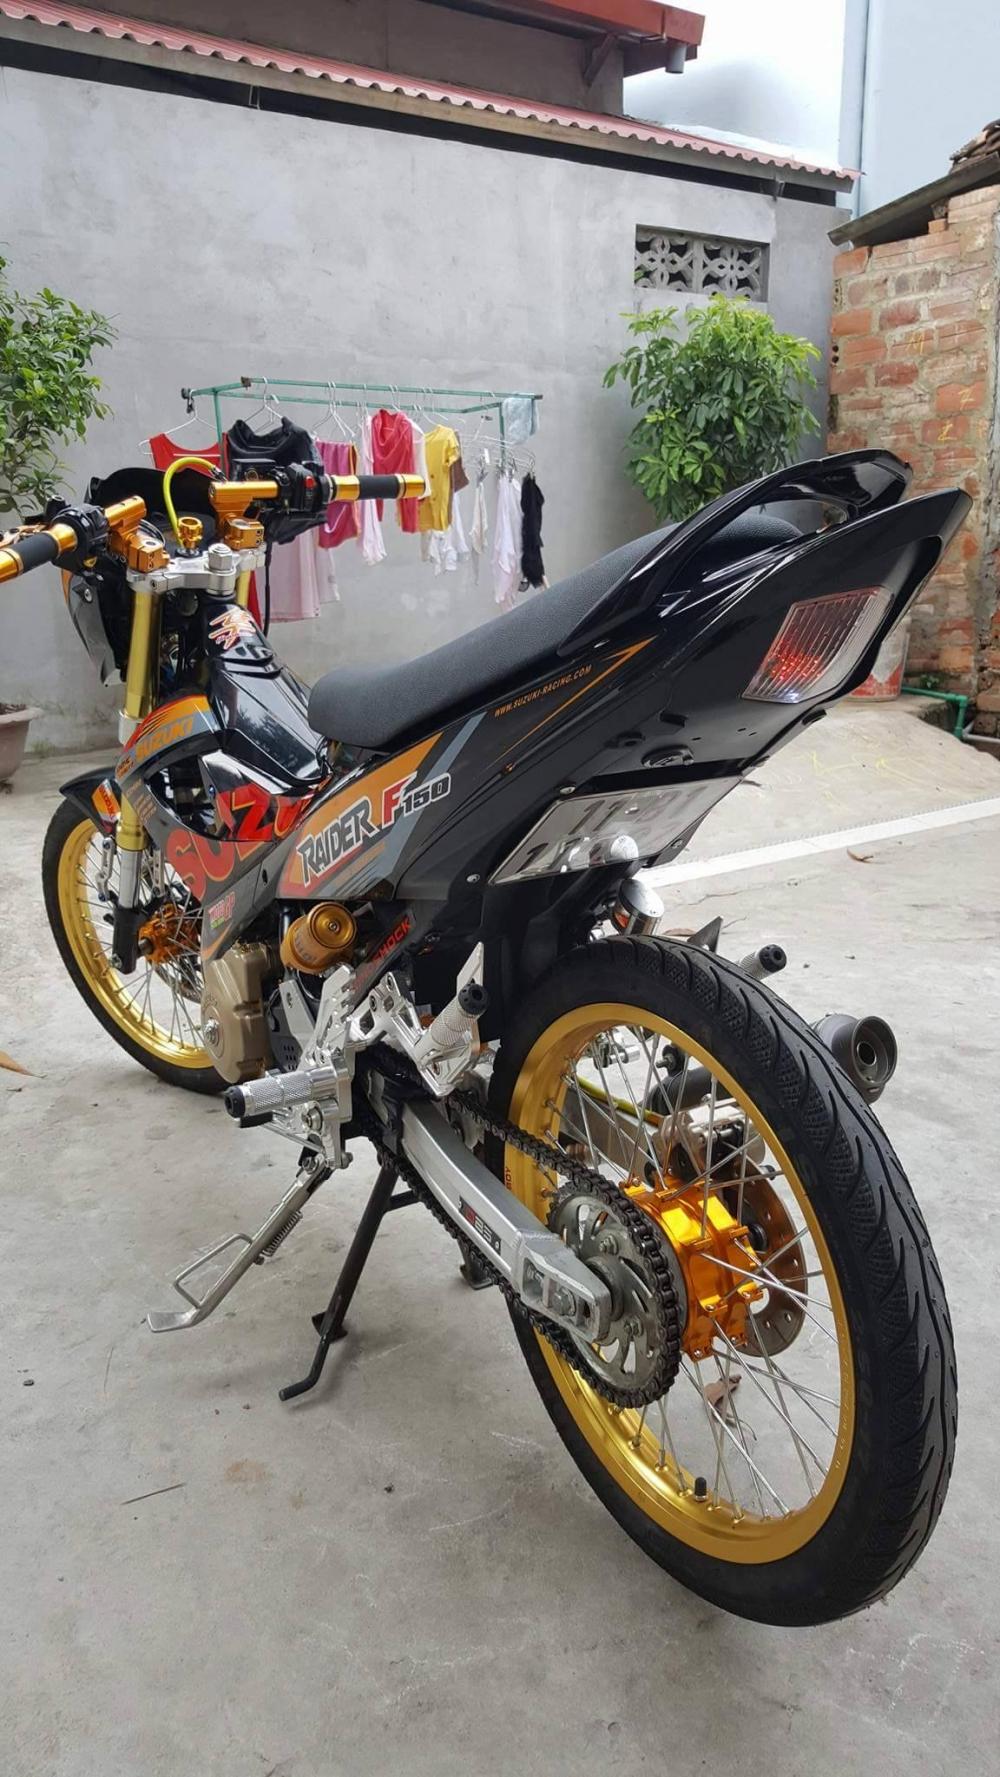 Suzuki Raider day noi bat trong version Racingboy - 3